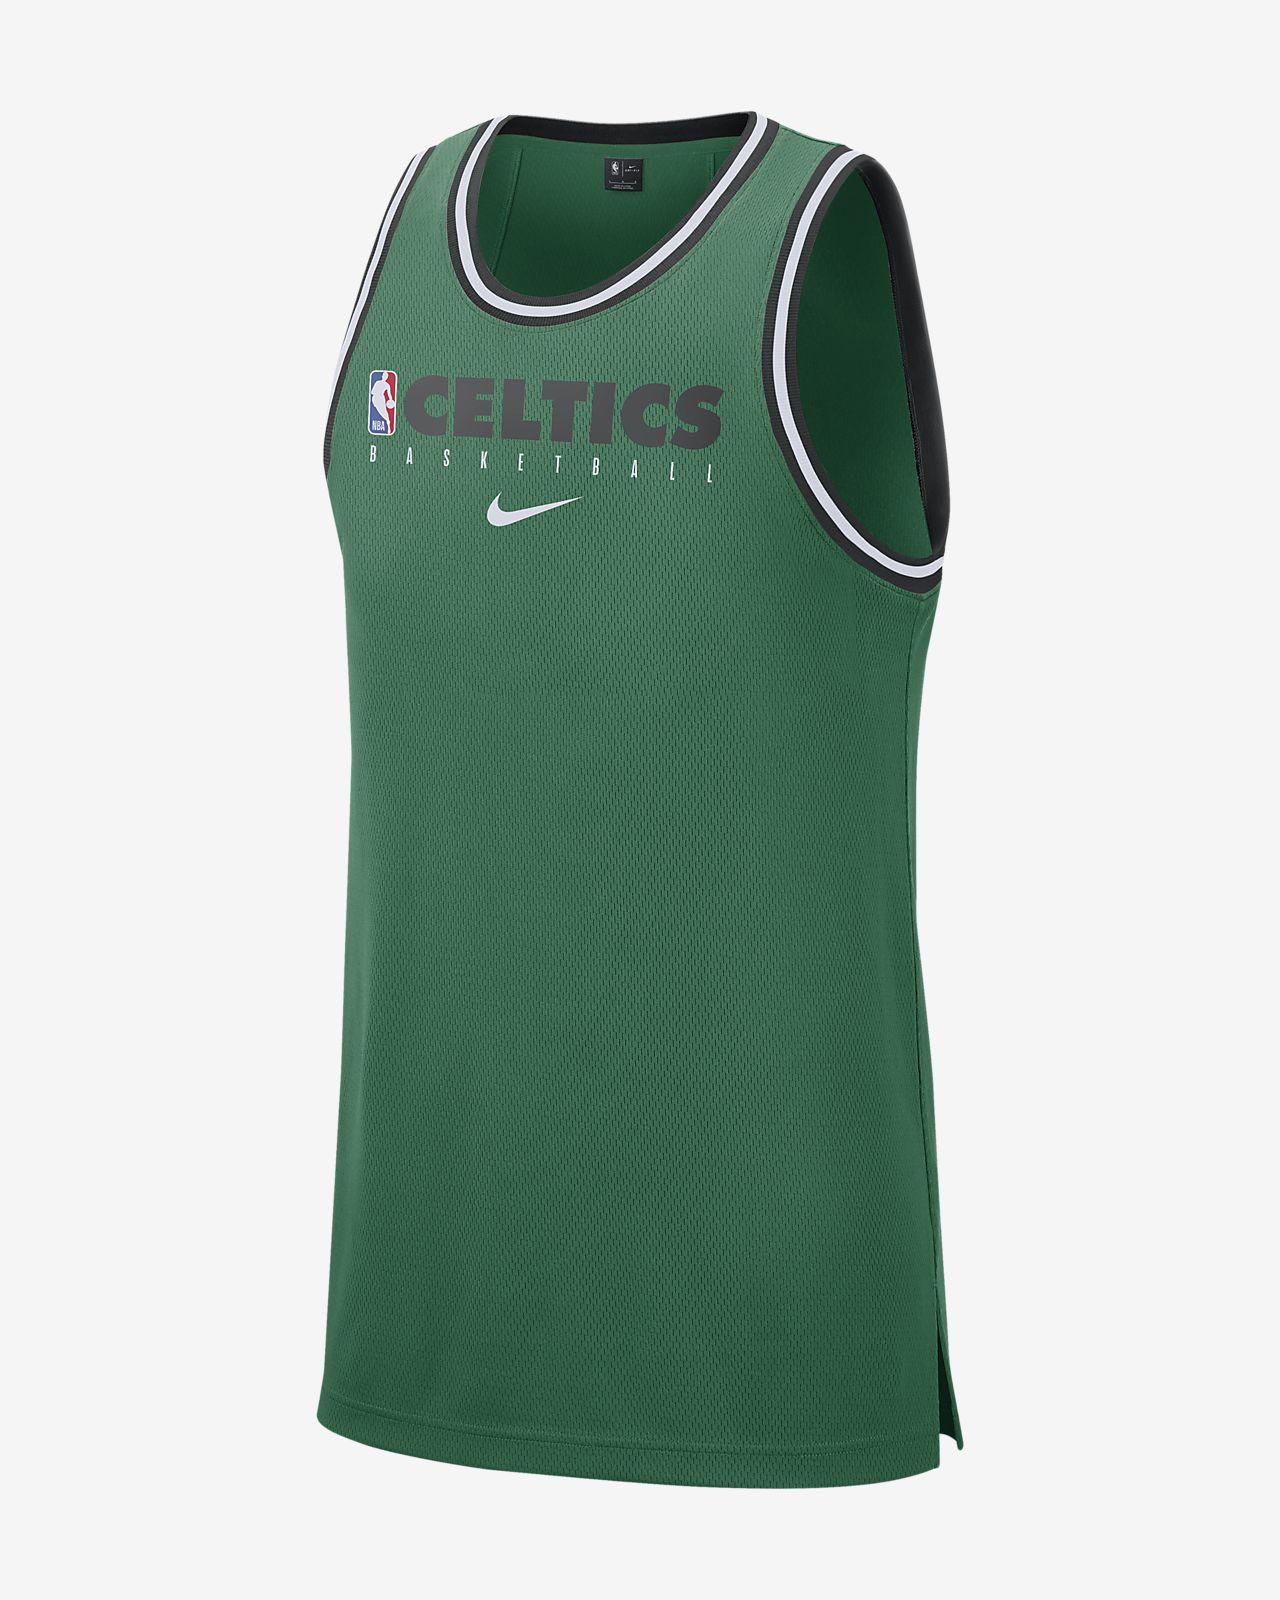 Canotta Boston Celtics Nike Dri-FIT NBA - Uomo